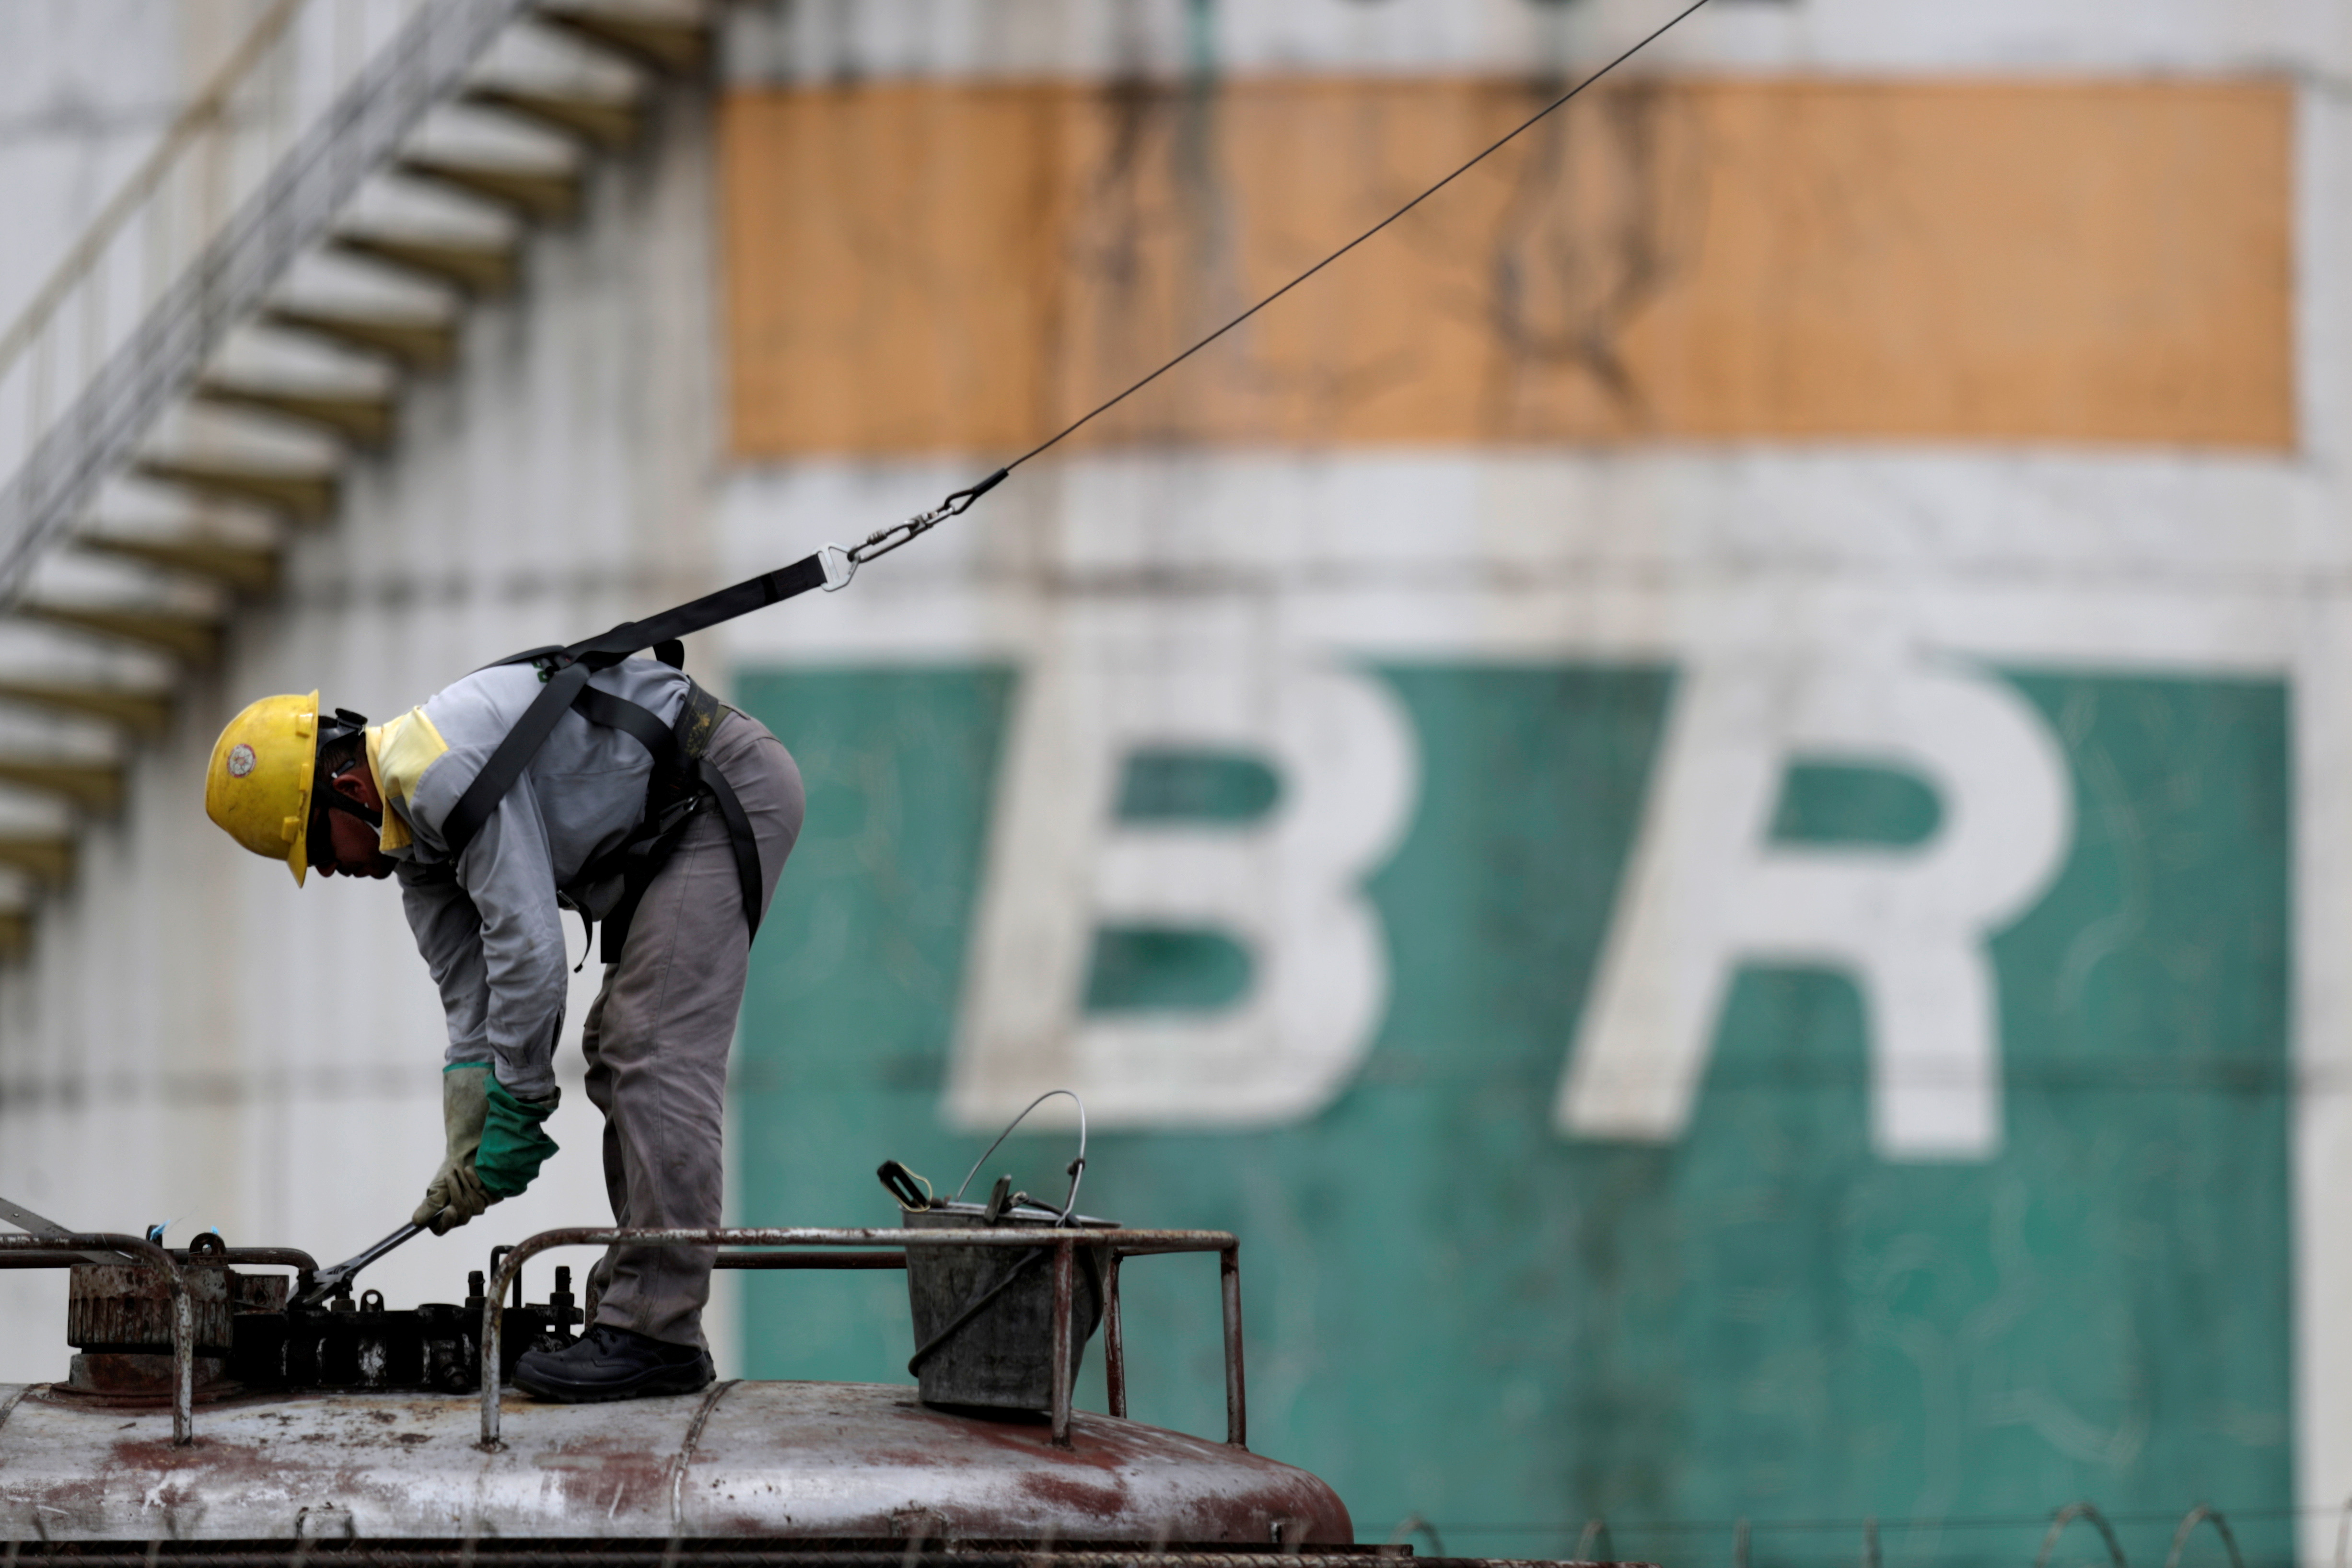 A worker checks the fuel volumes on a train wagon near a tank of Brazil's state-run Petrobras oil company in Brasilia, Brazil, February 19, 2021. REUTERS/Ueslei Marcelino/File Photo